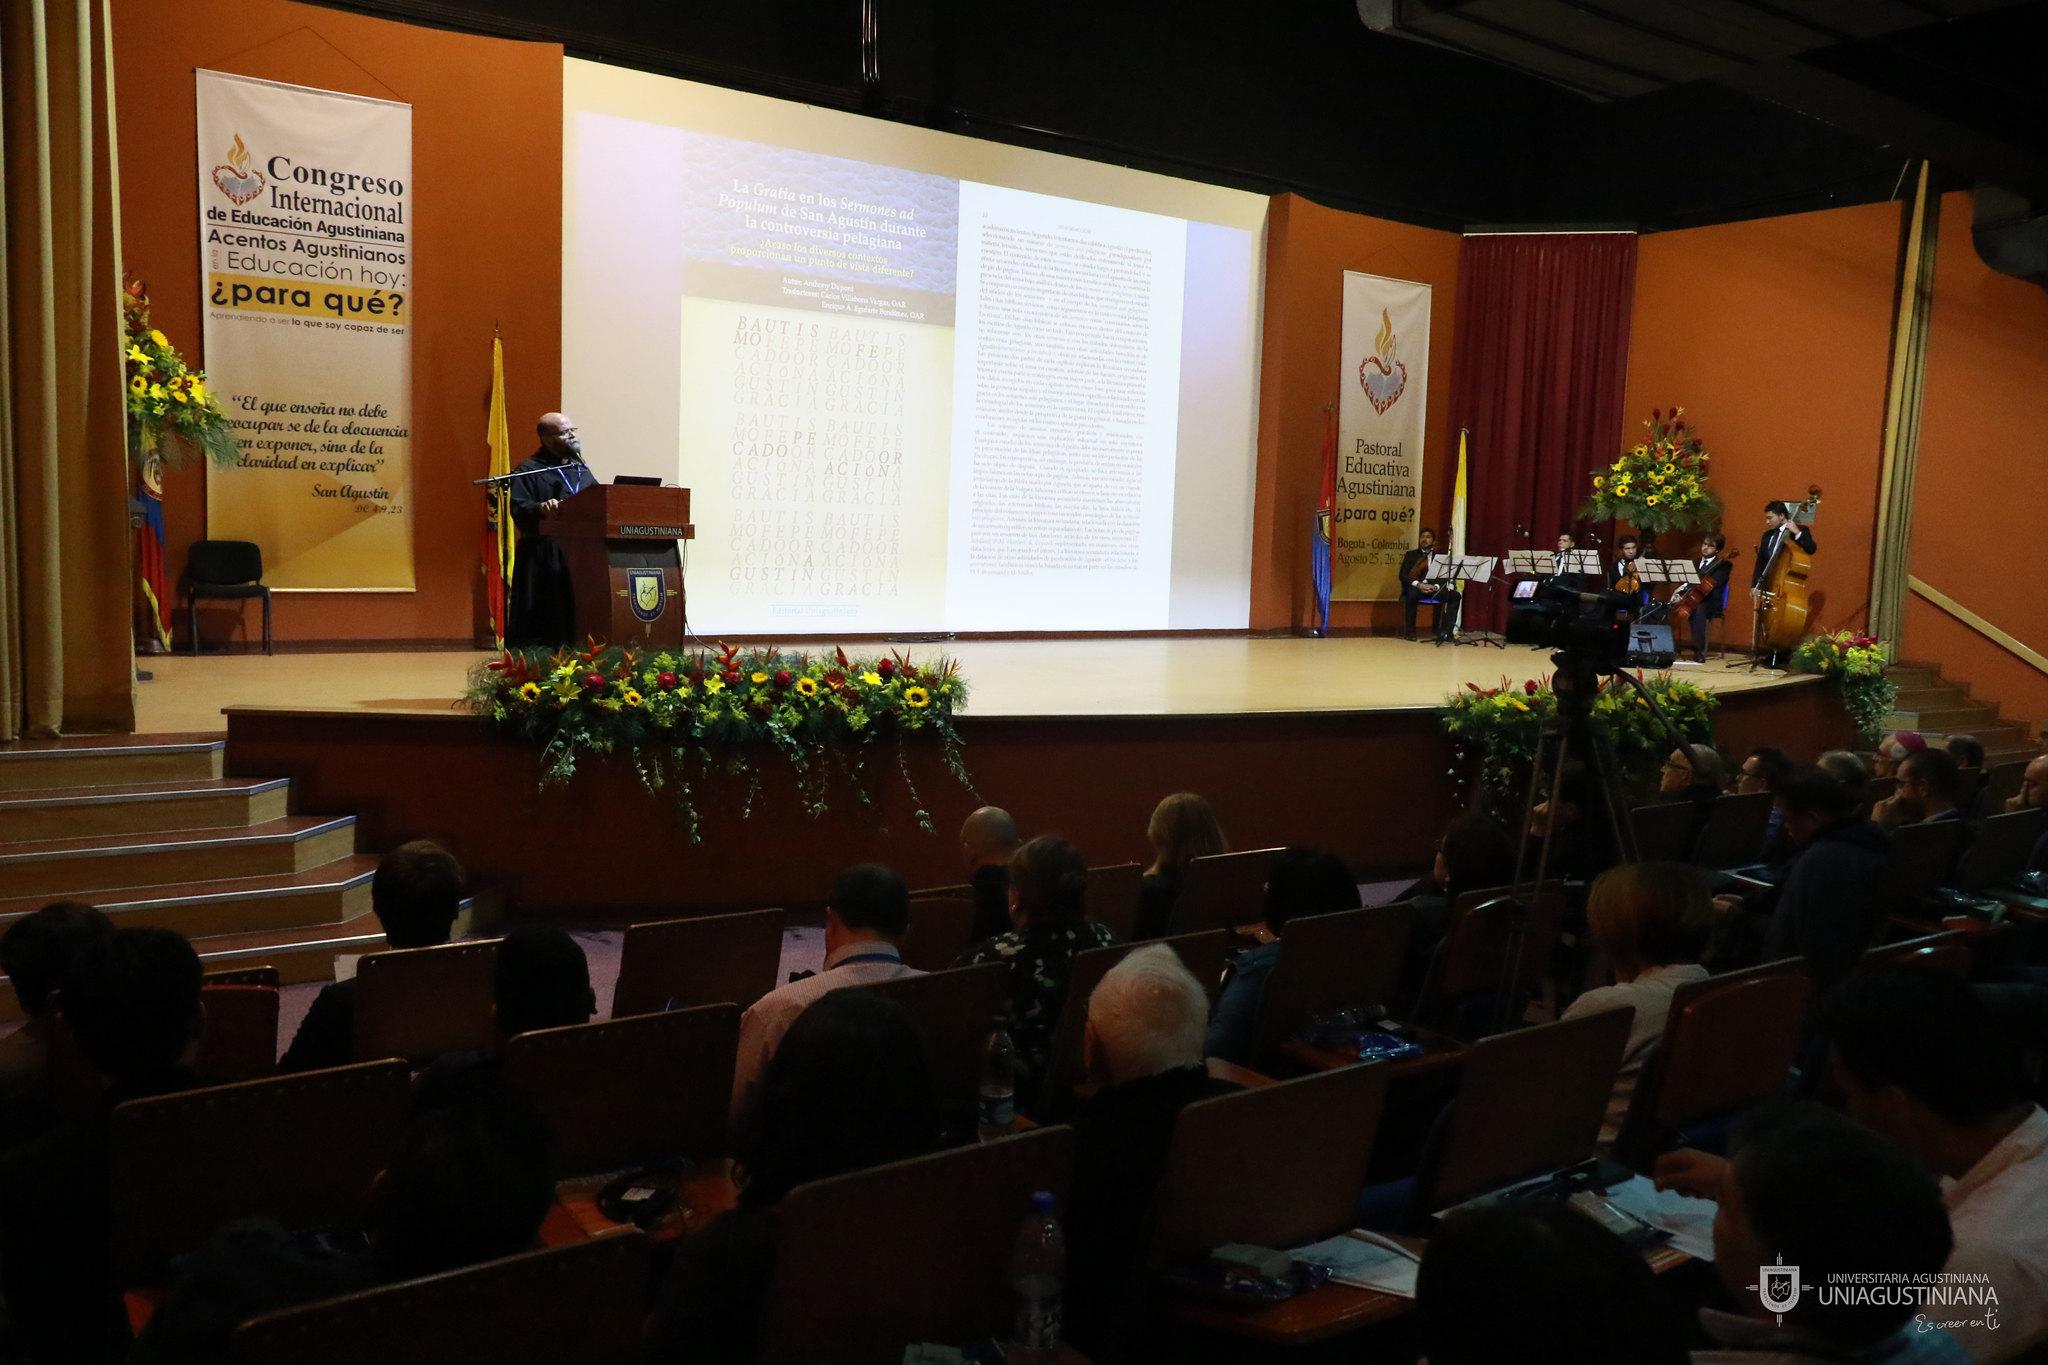 Primer día: Congreso Internacional de Educación Agustiniana